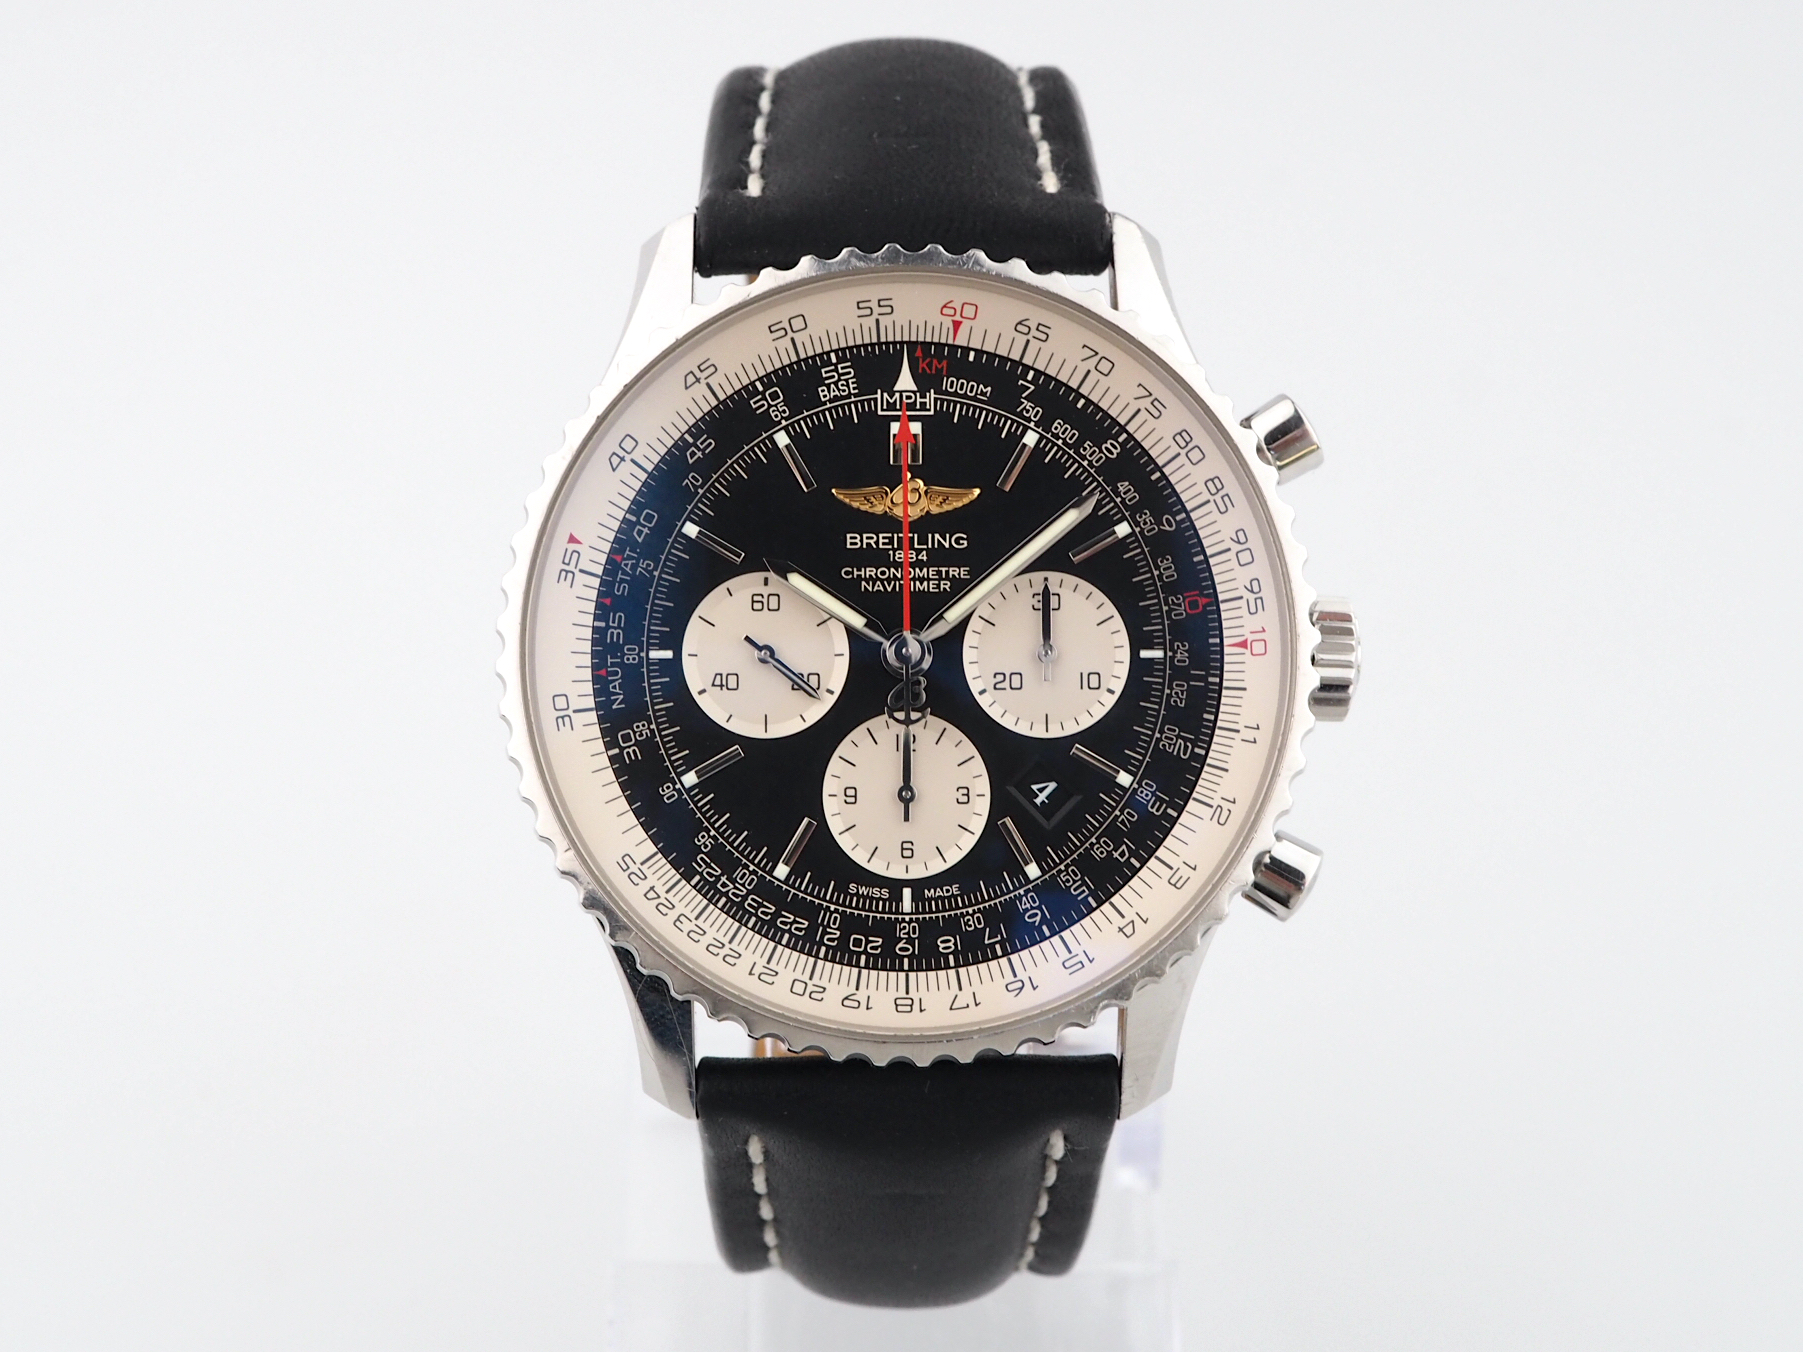 Breitling Navitimer 1 B01 Chronograph